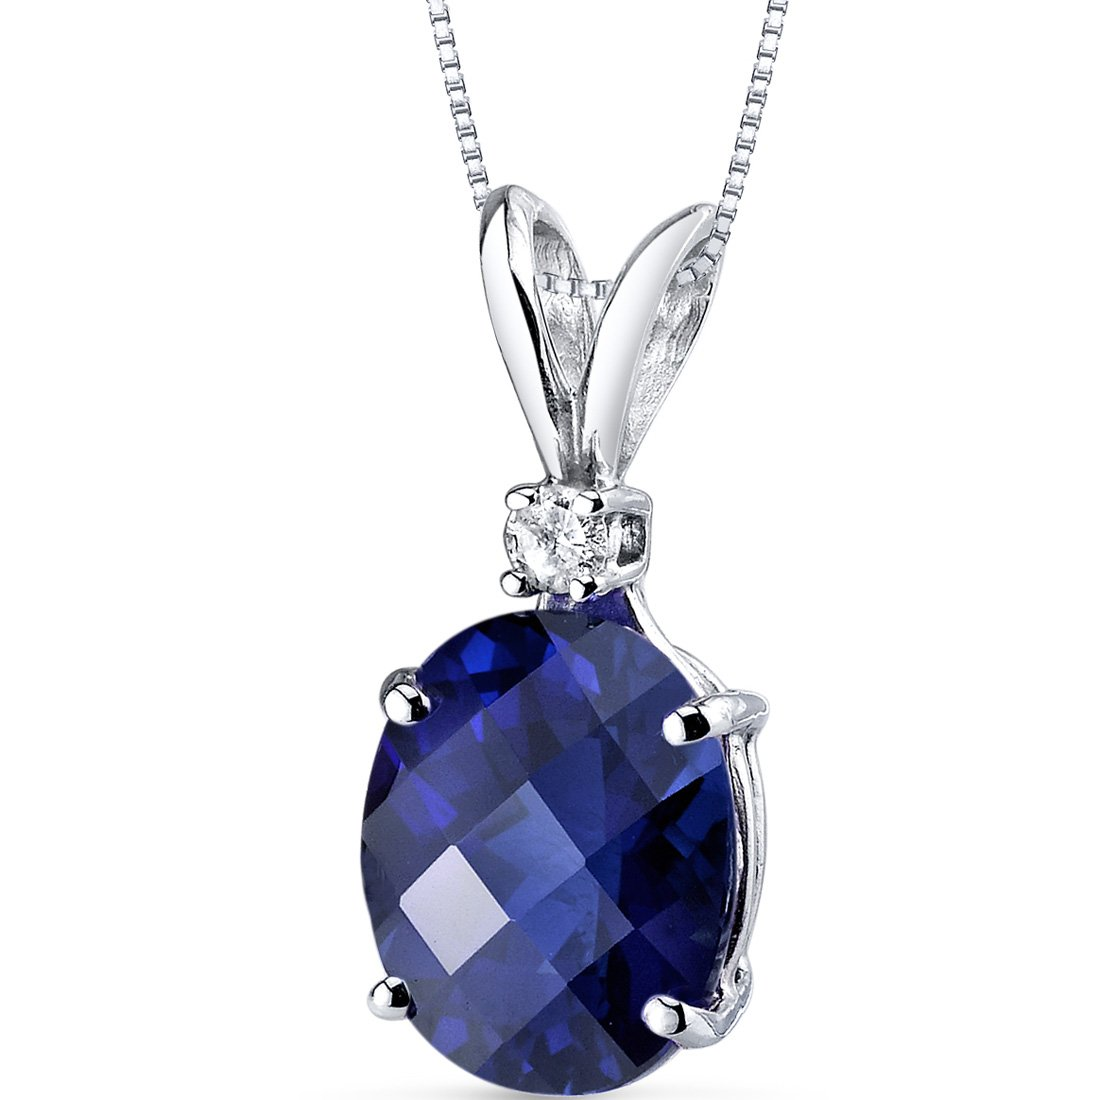 14 Karat White Gold Oval Shape 3.50 Carats Created Blue Sapphire Diamond Pendant by Peora